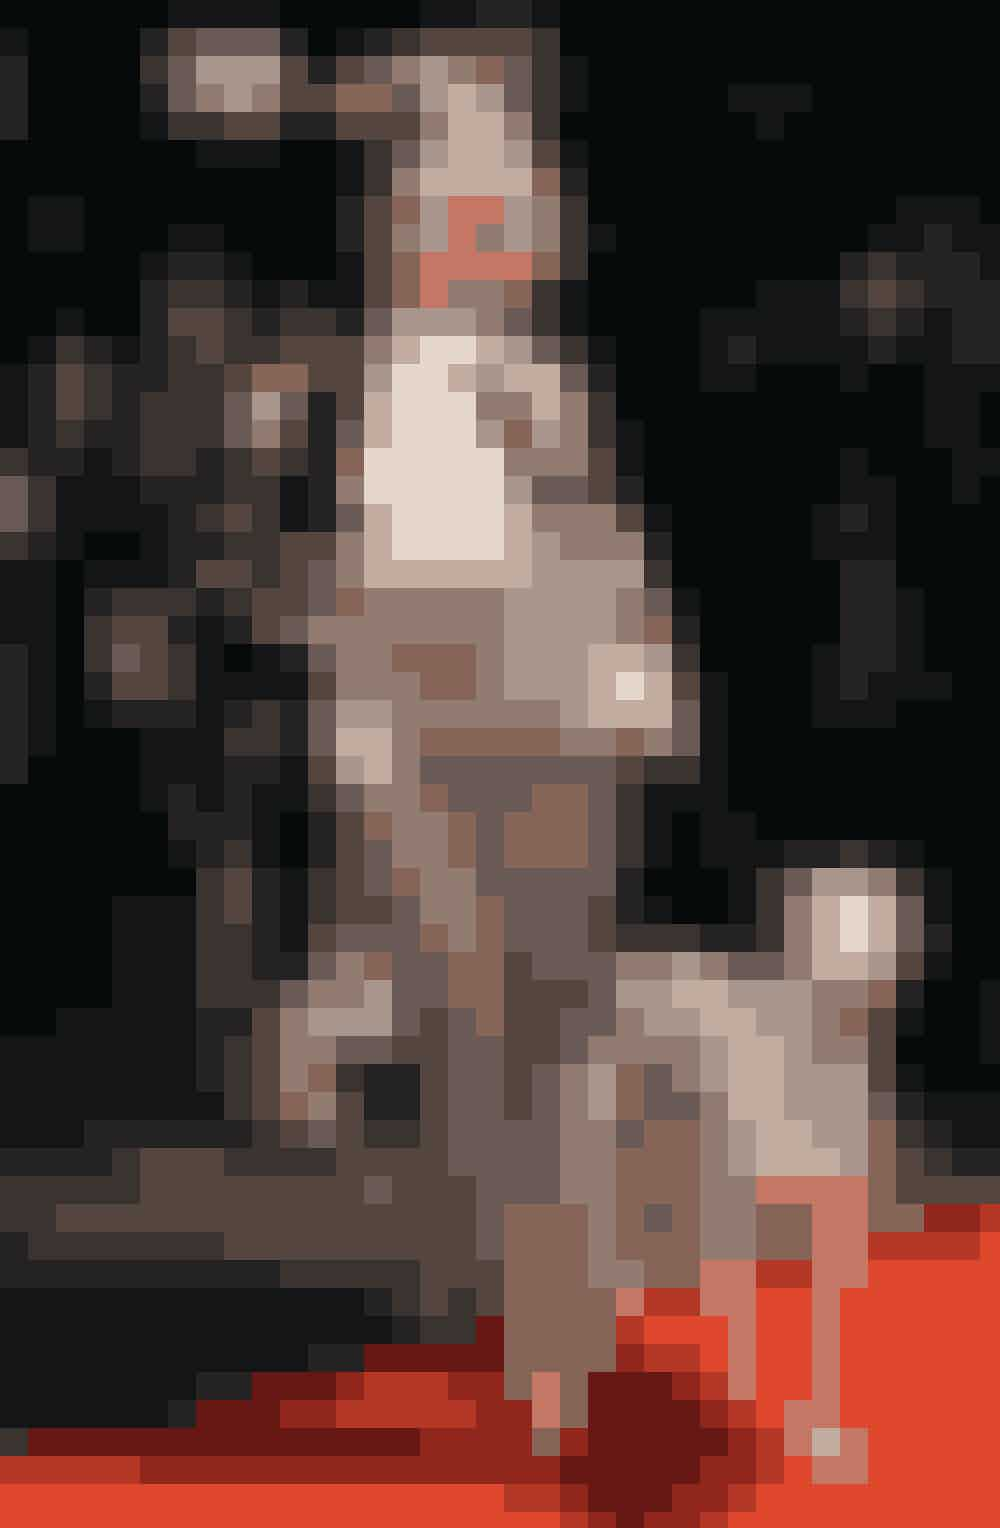 Sangeride Iggy Azalea som Cruella de Vil fra '101 dalmatinere'.